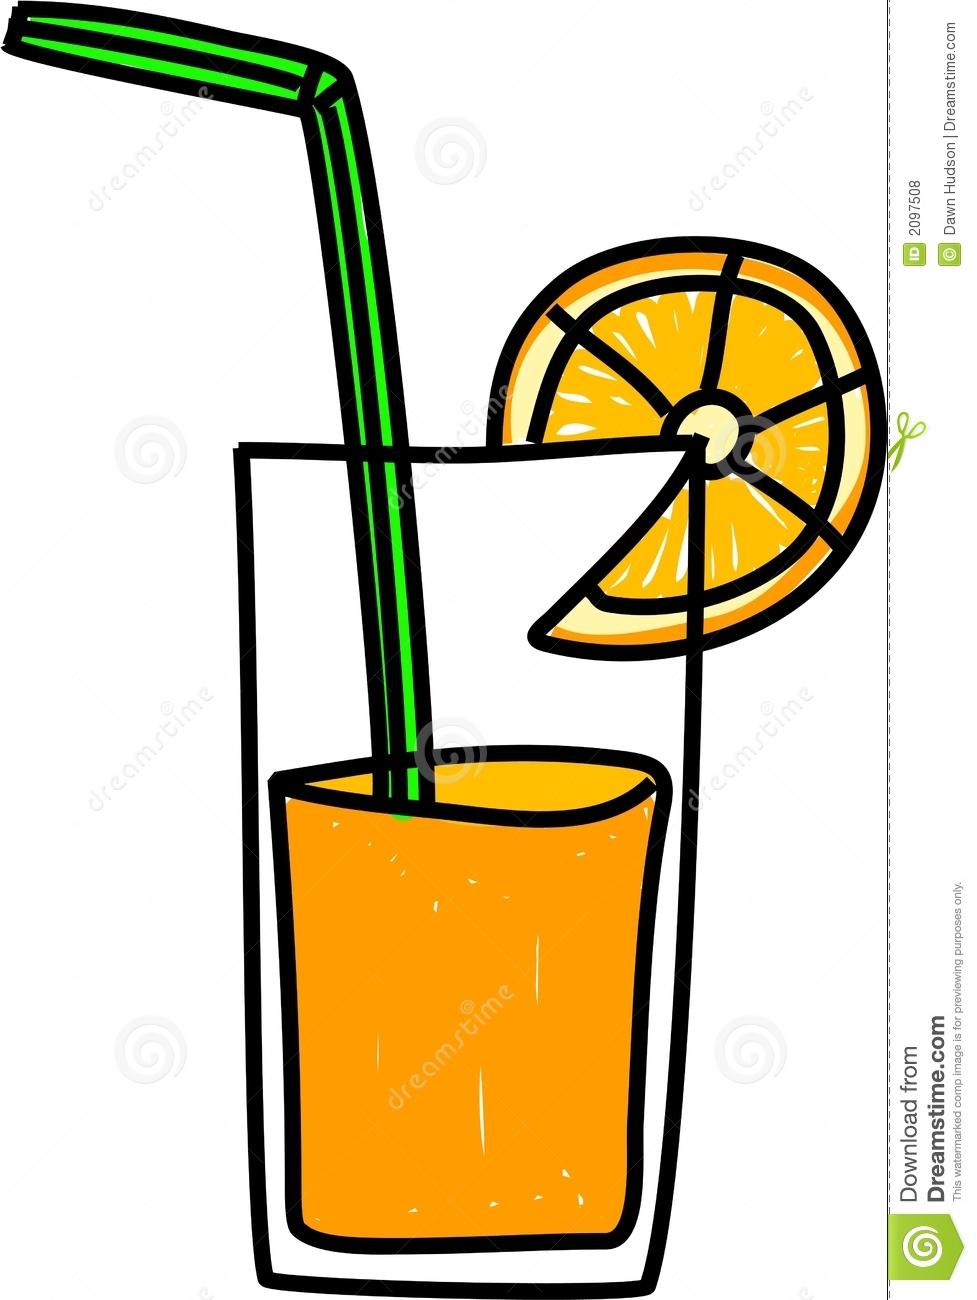 Glass of orange panda. Juice clipart oren